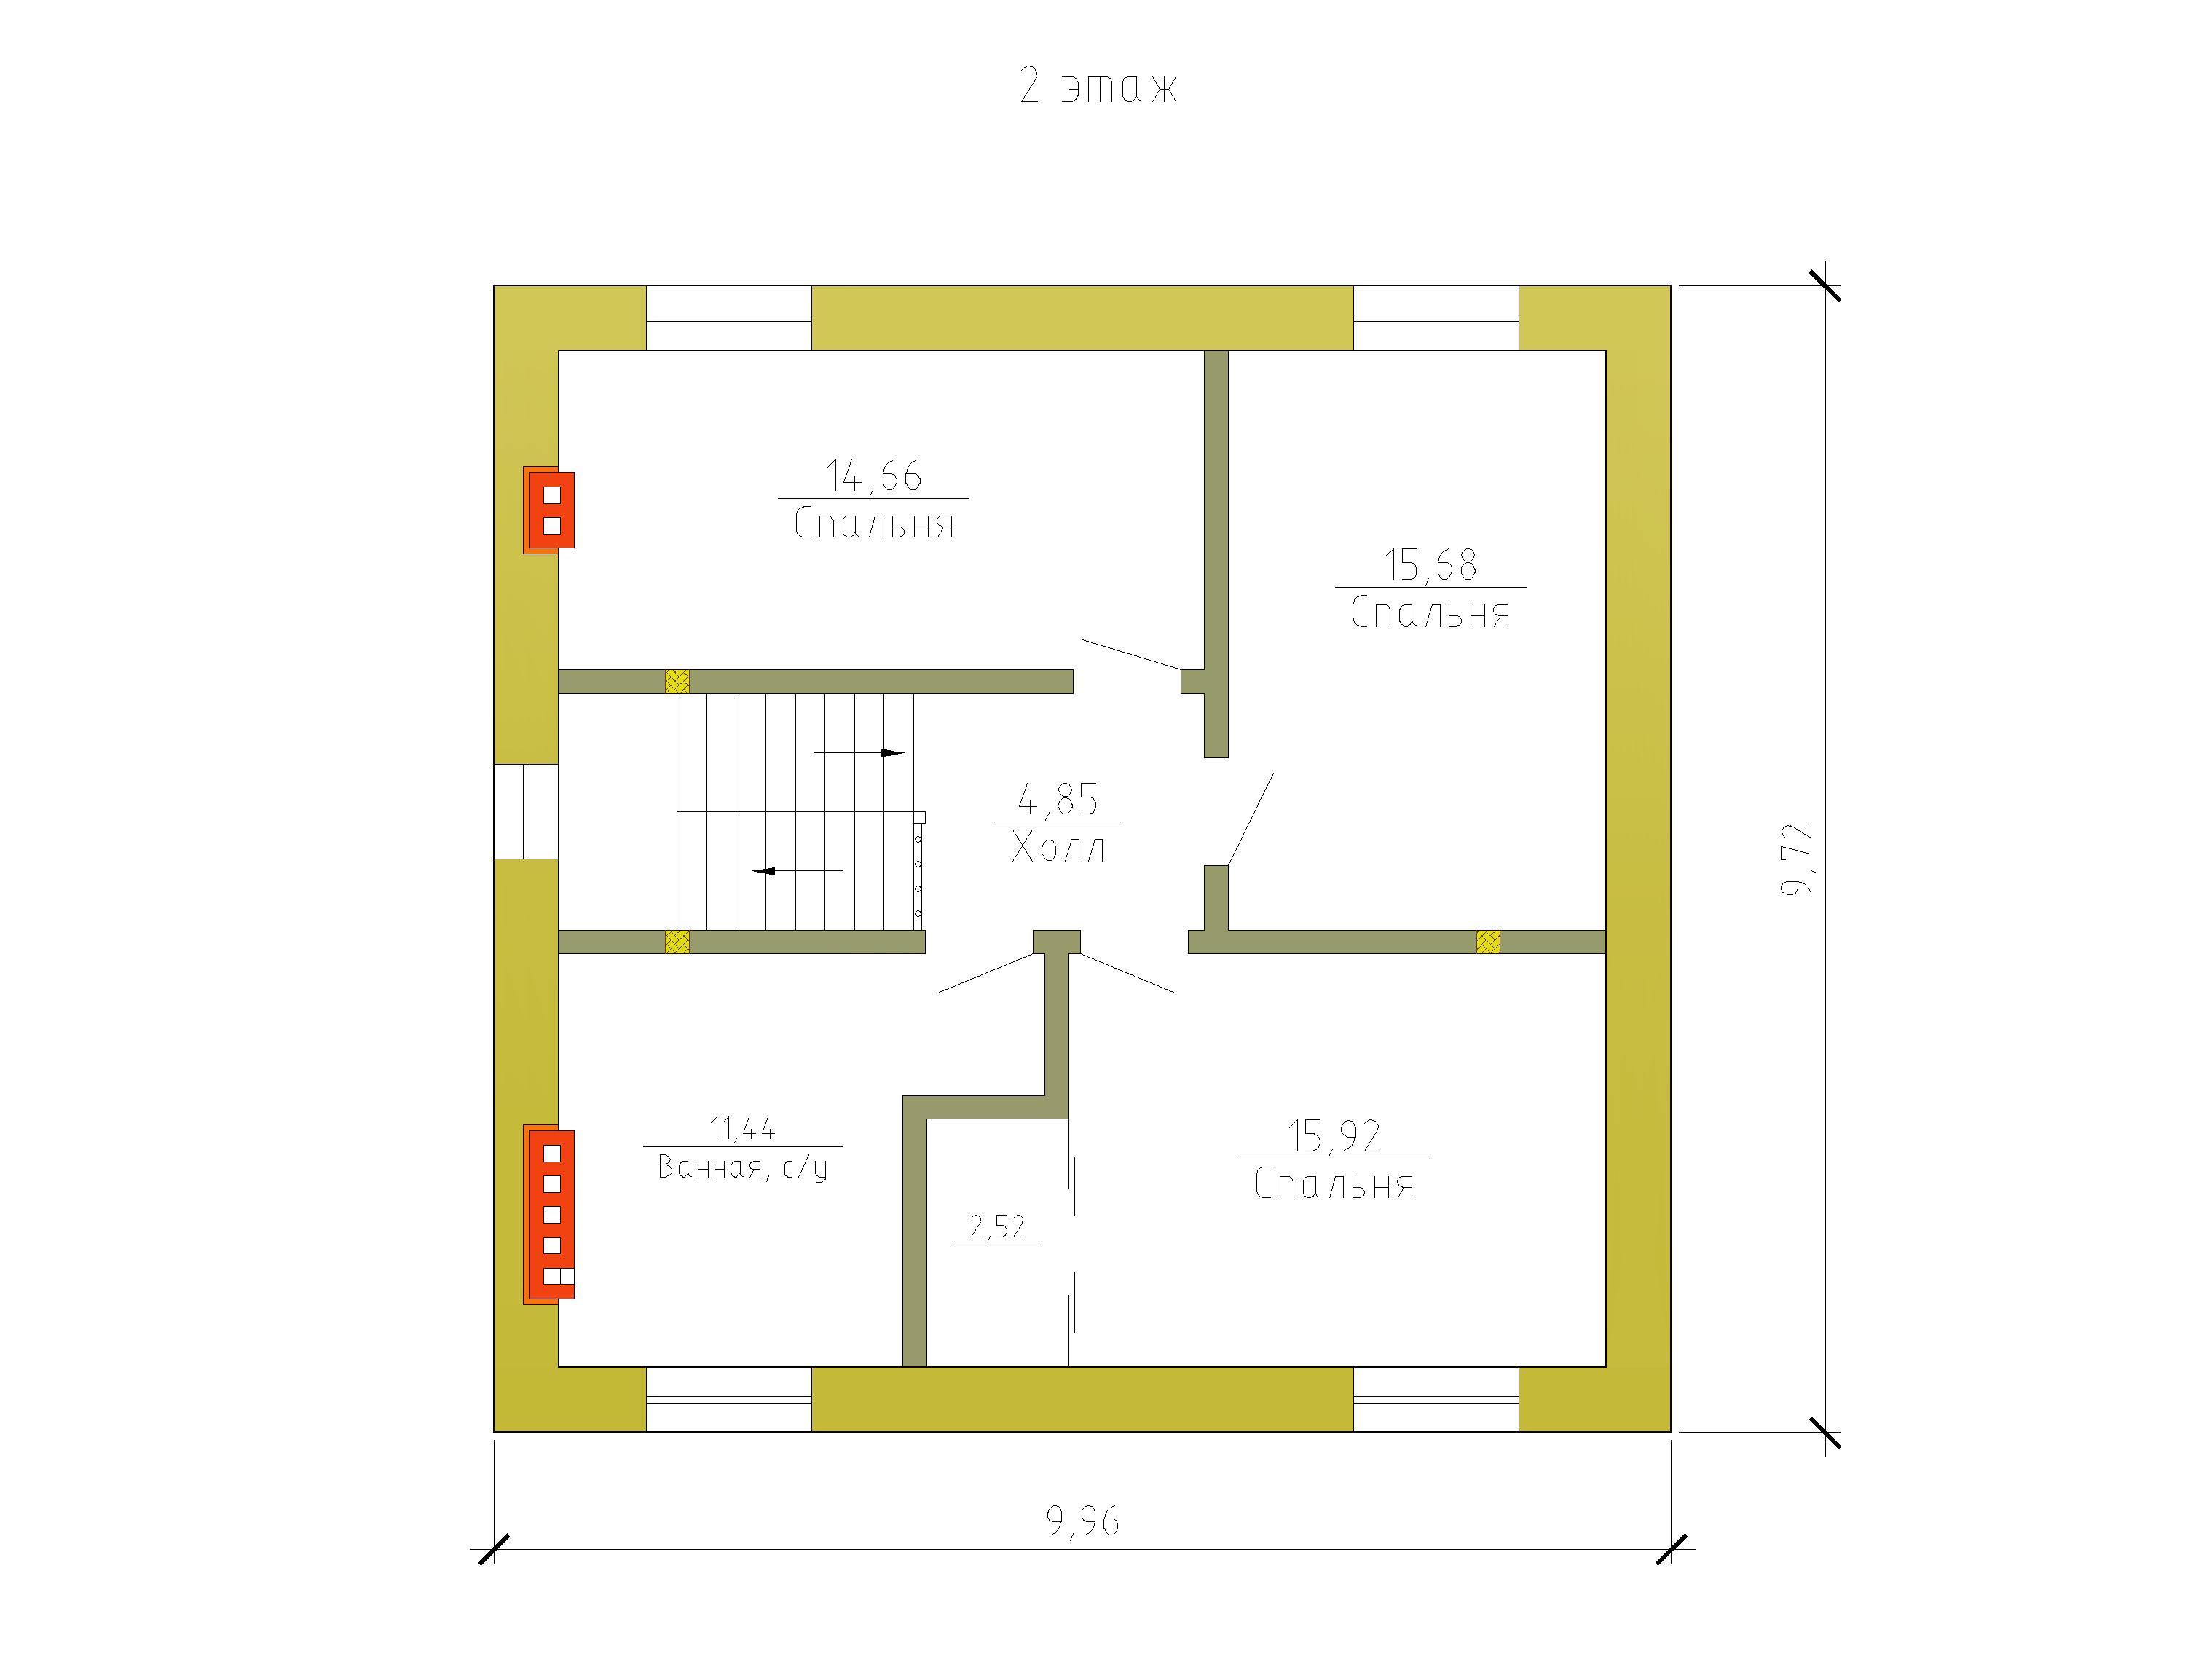 5 Готовый проект коттеджа 125 м2 / Артикул Э-56 план